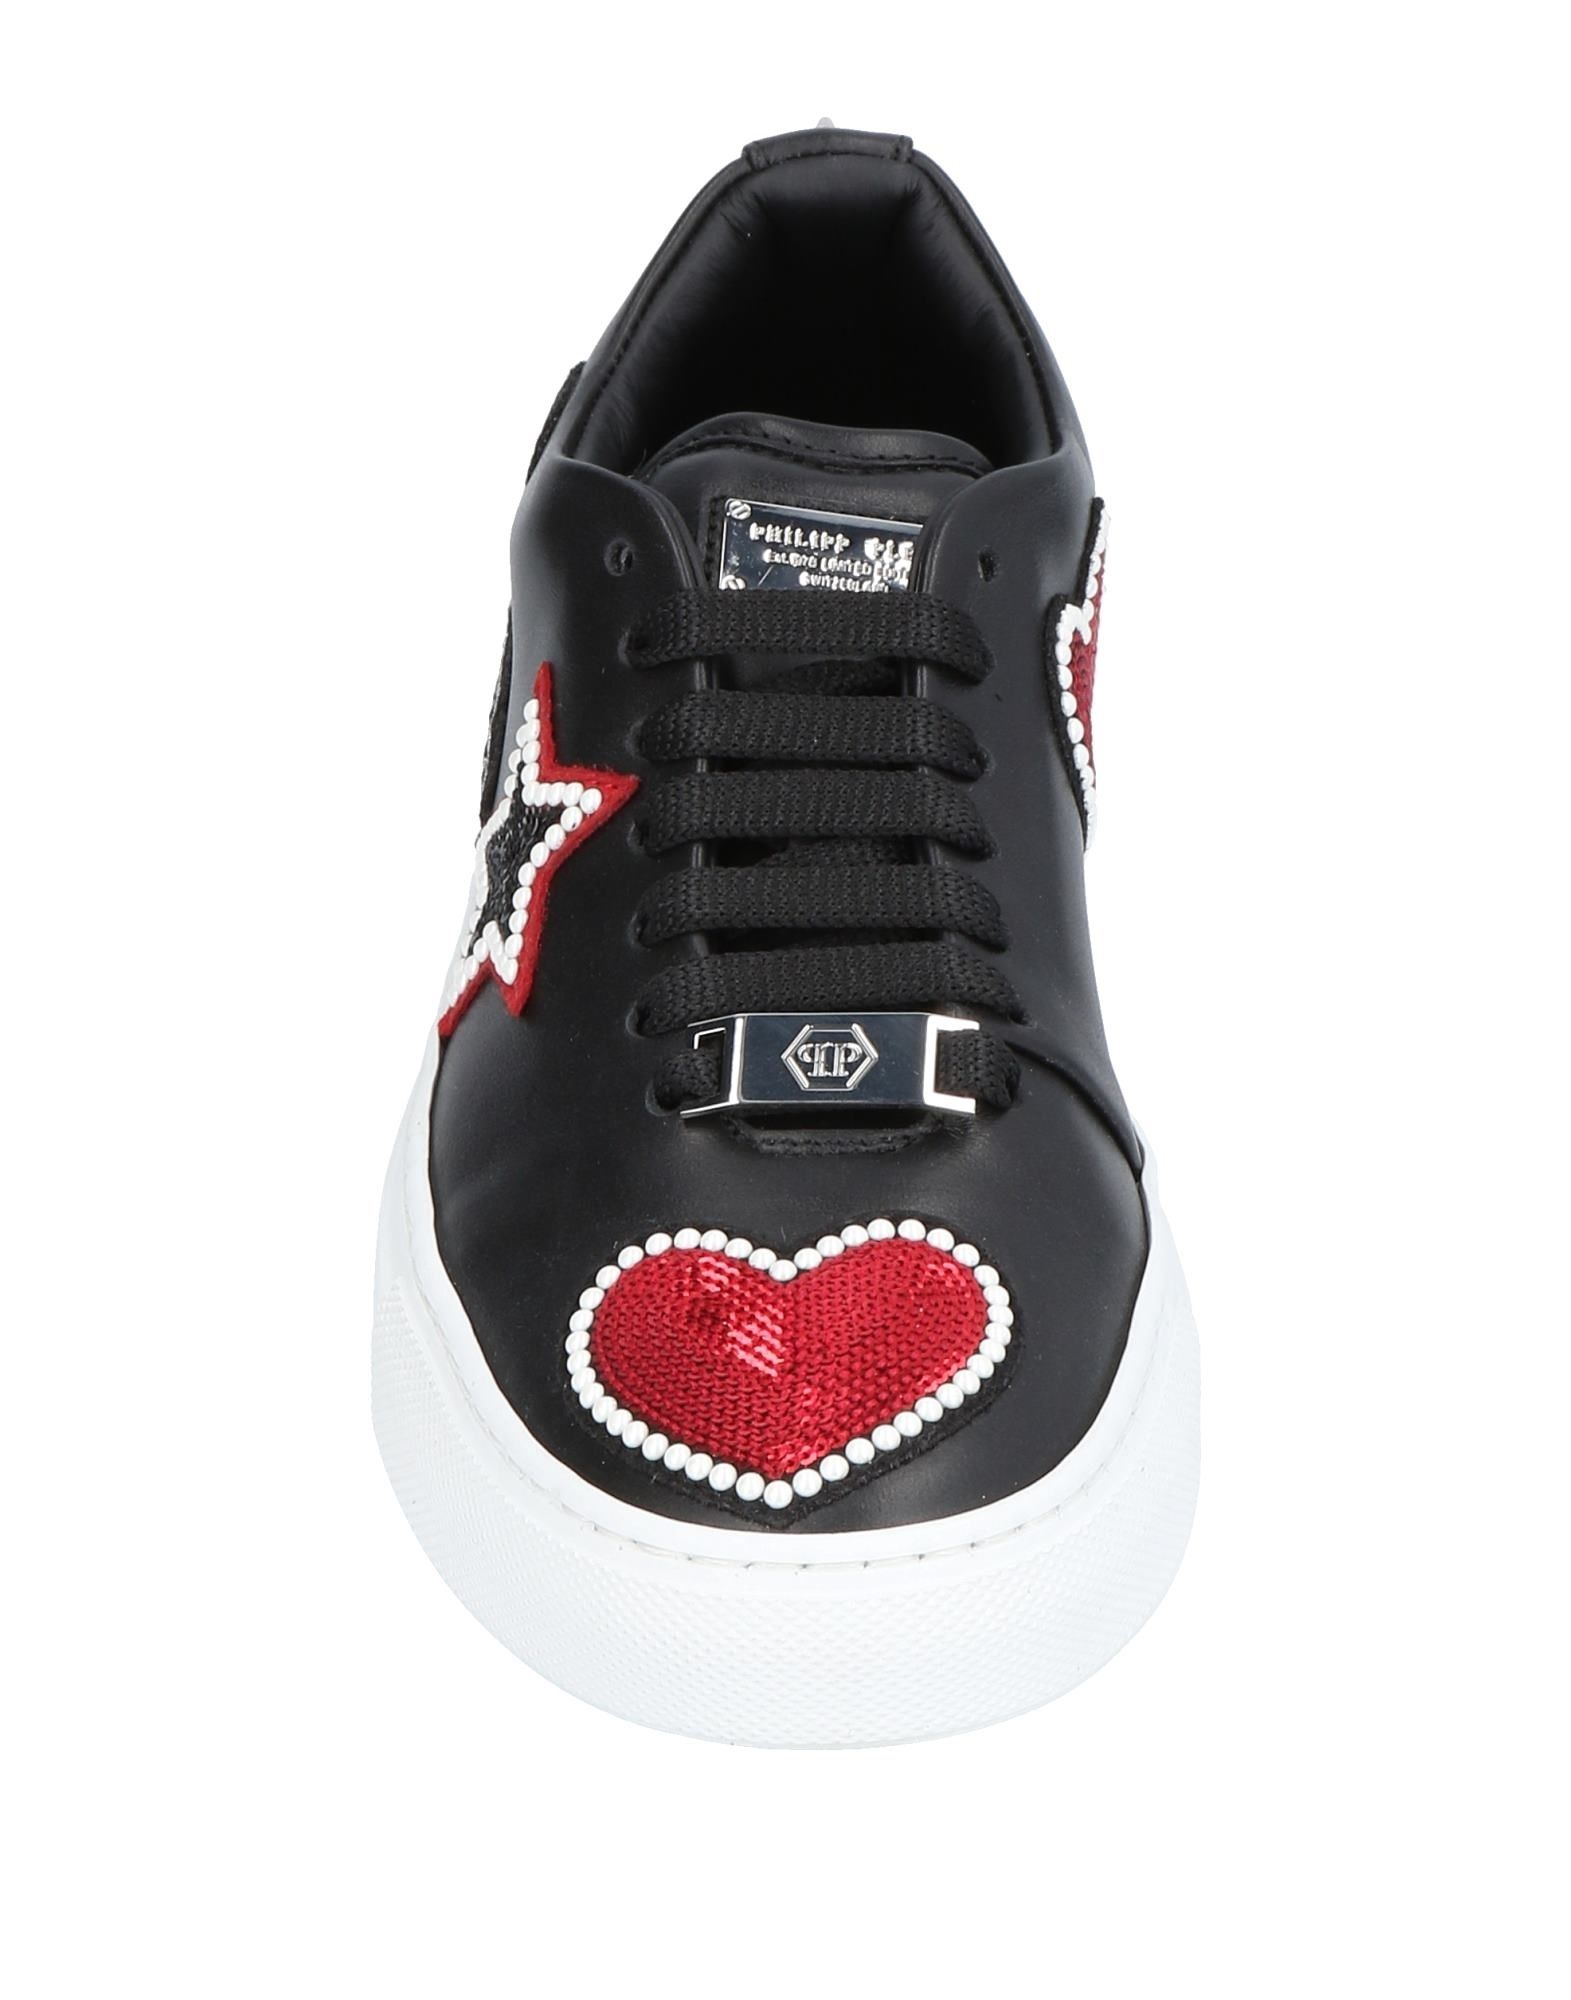 Rabatt Schuhe  Philipp Plein Sneakers Damen  Schuhe 11463014SN a0ff8b